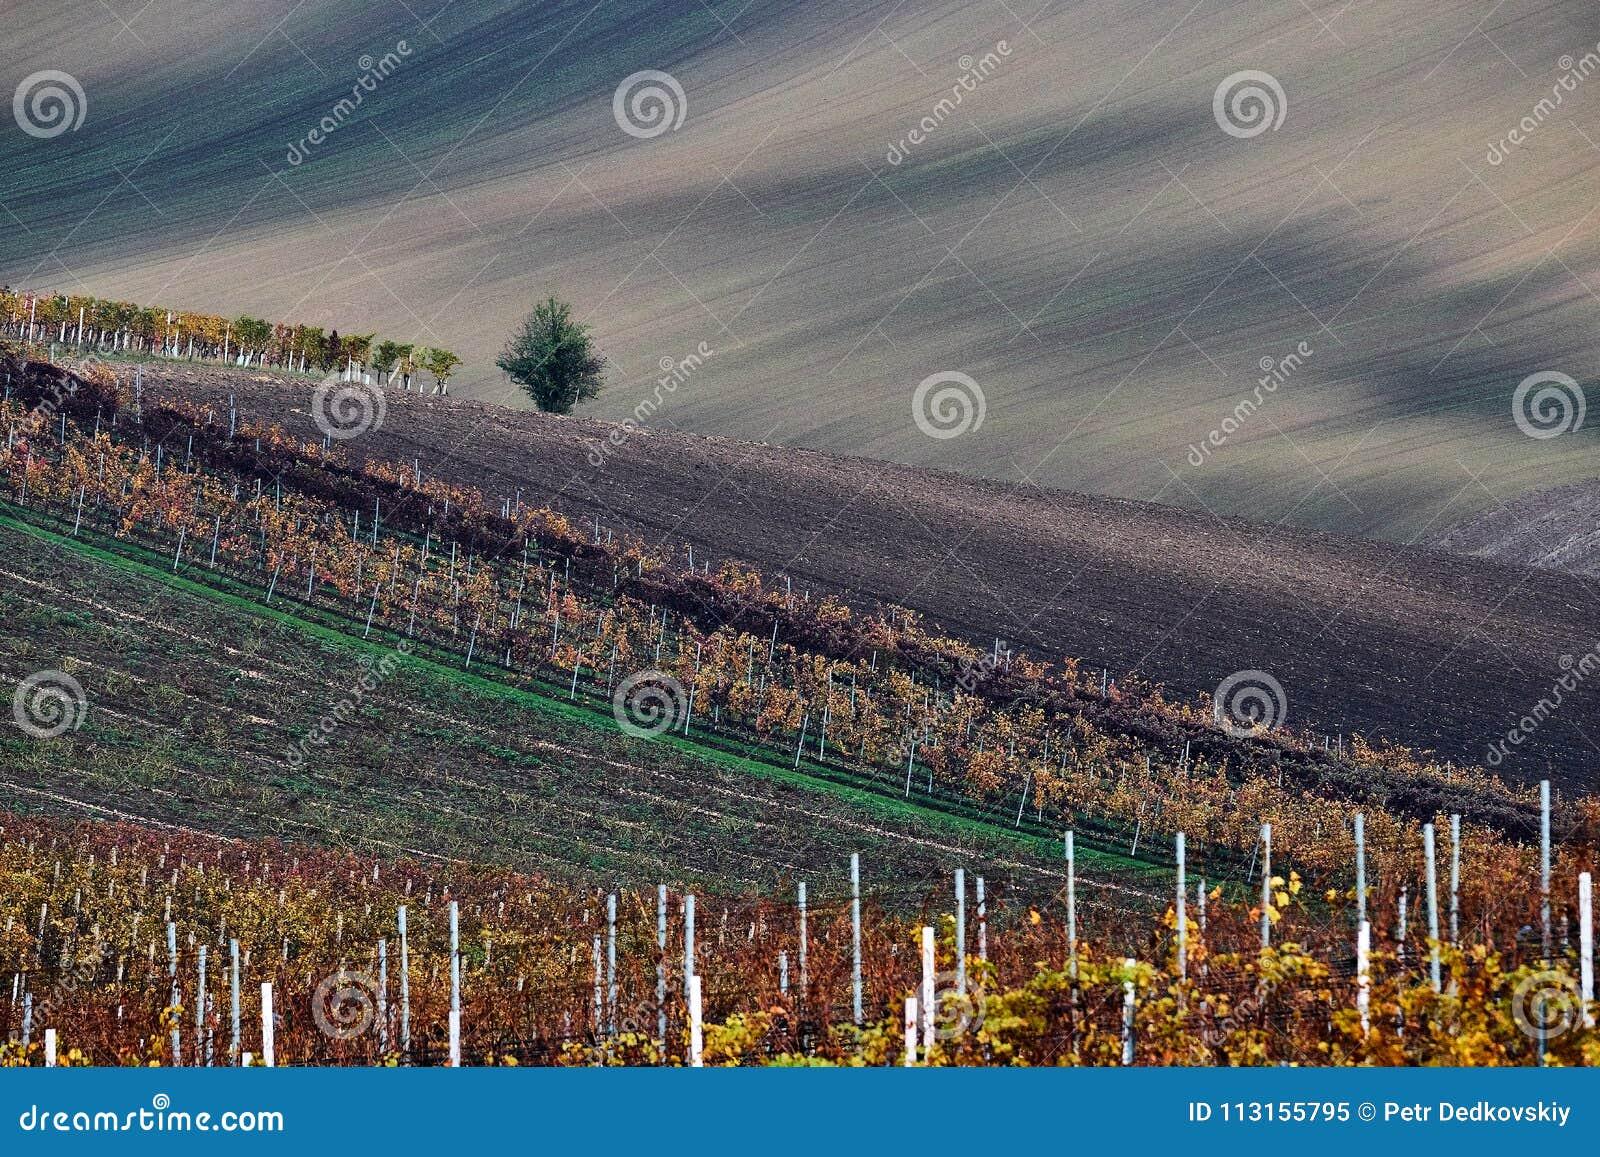 Vineyard and fields in autumn, South Moravia.Czech Republic.